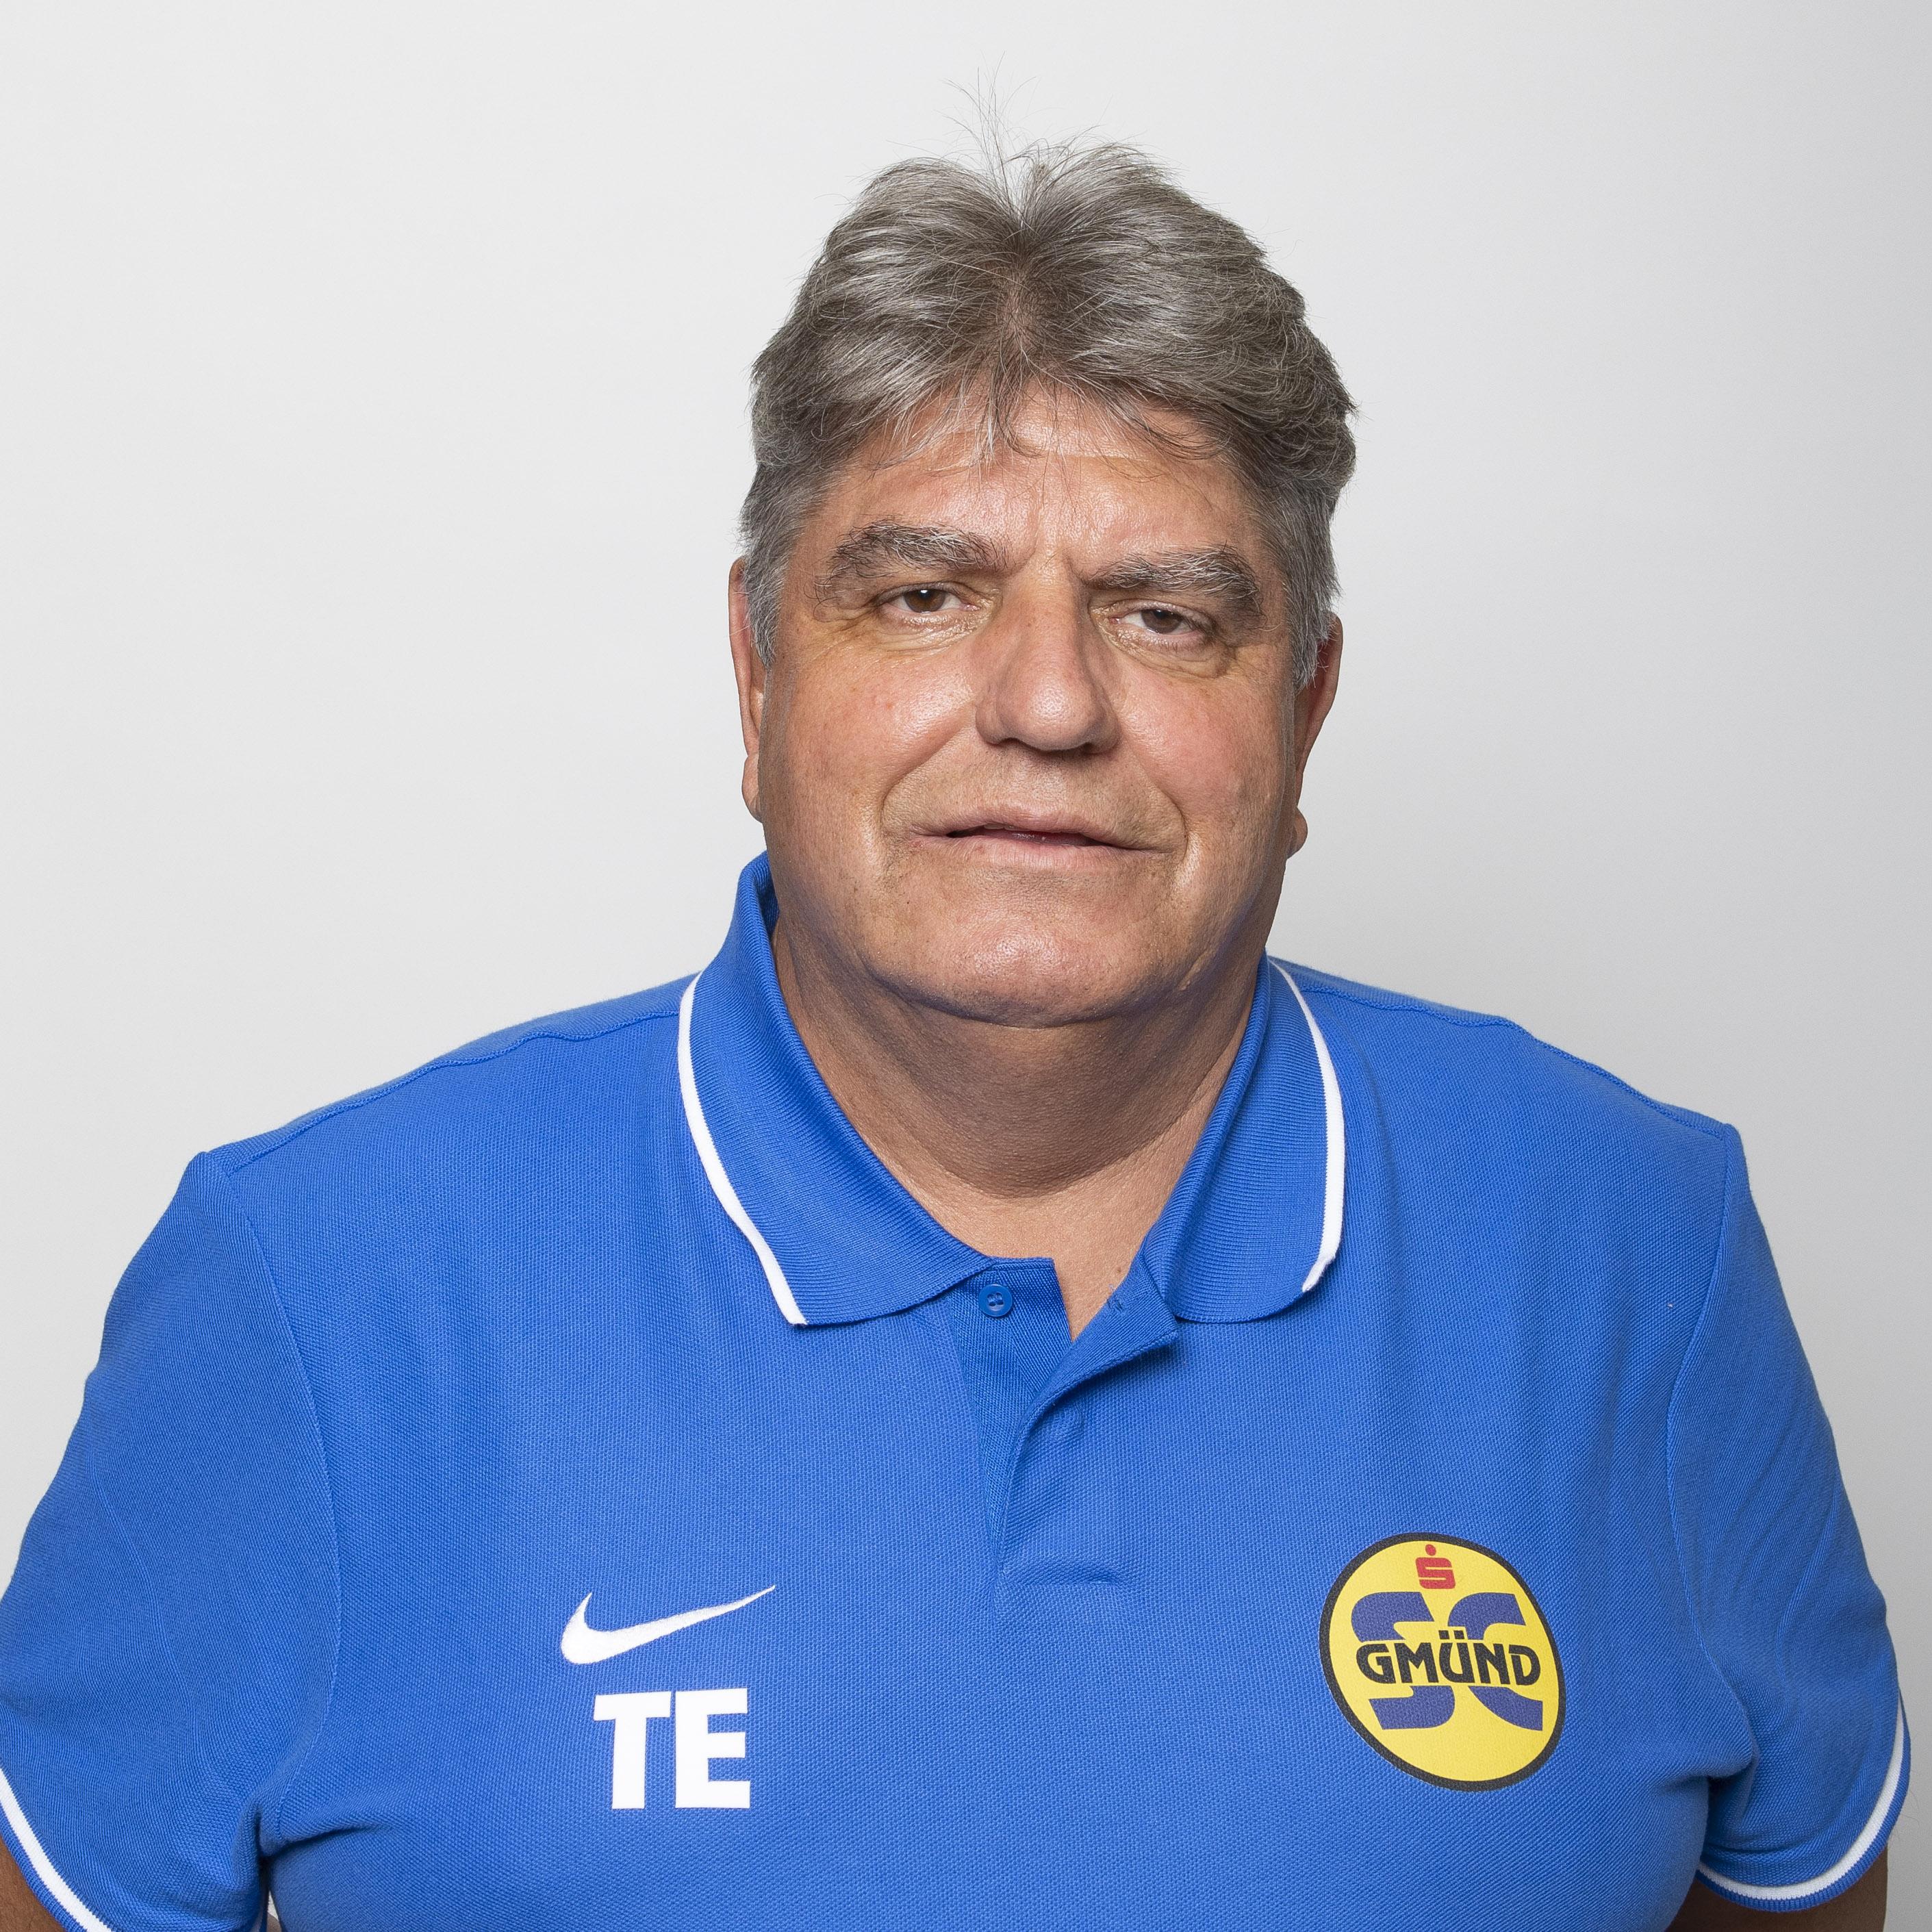 Thomas Emetsberger